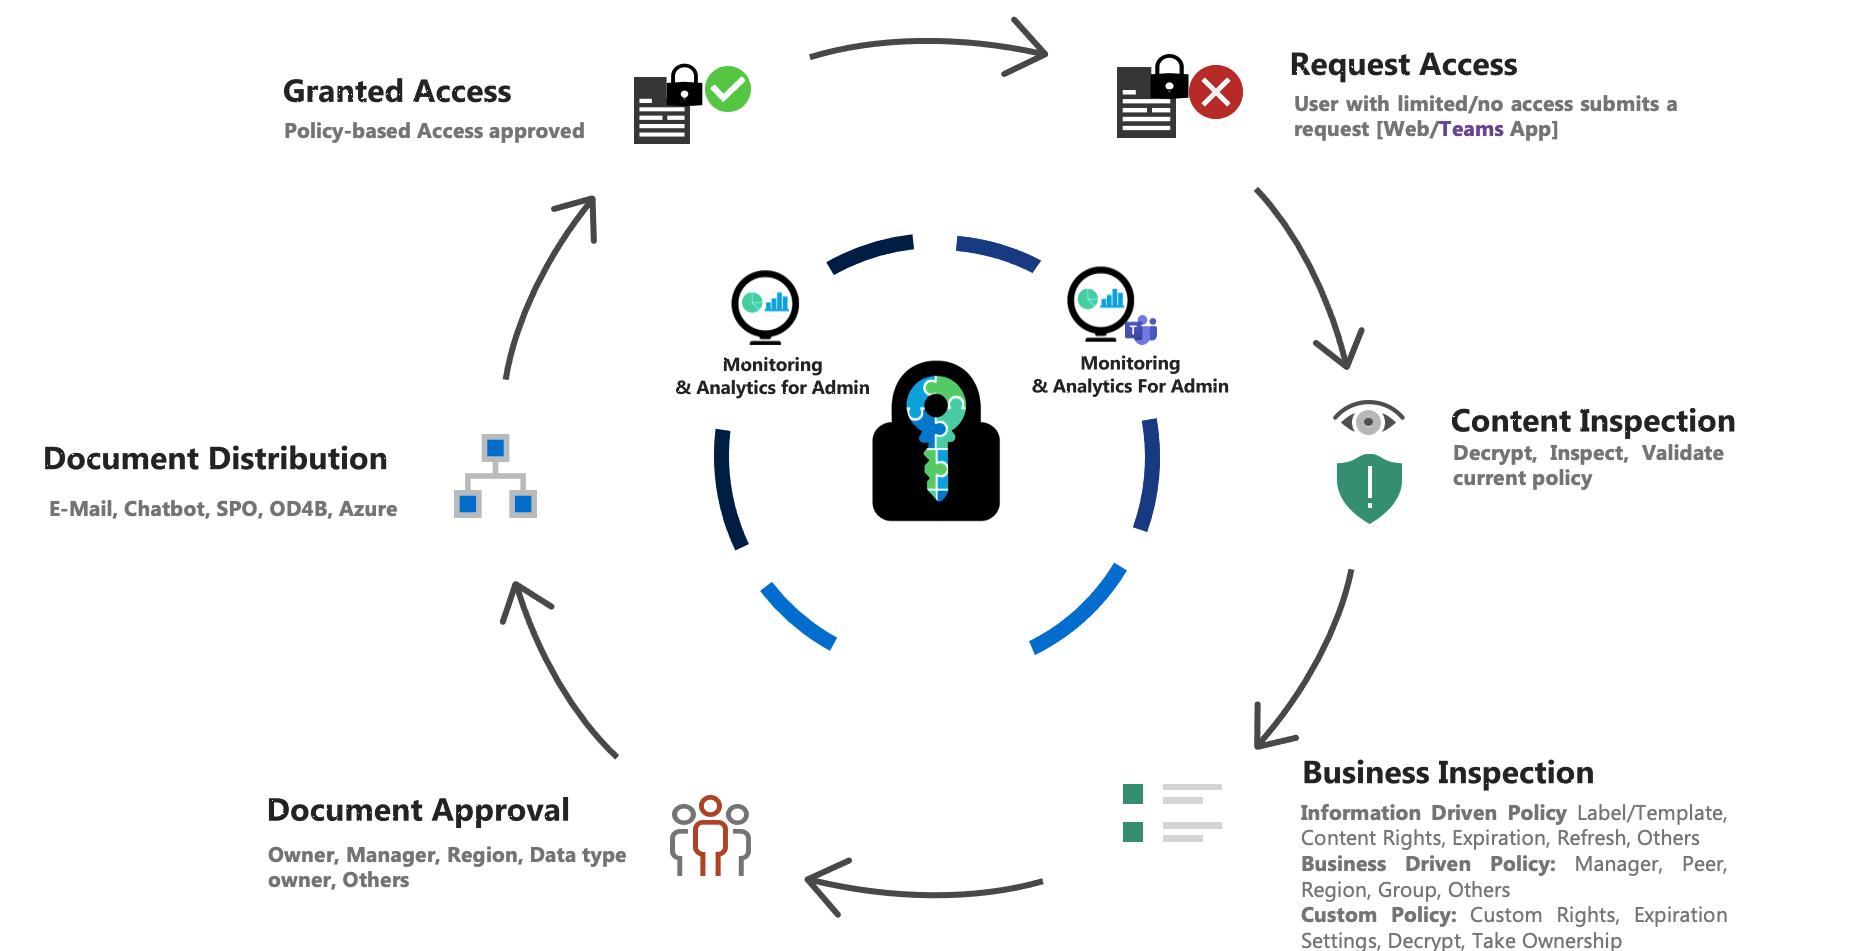 E-cryptor Monitoring & Analytics For Admin